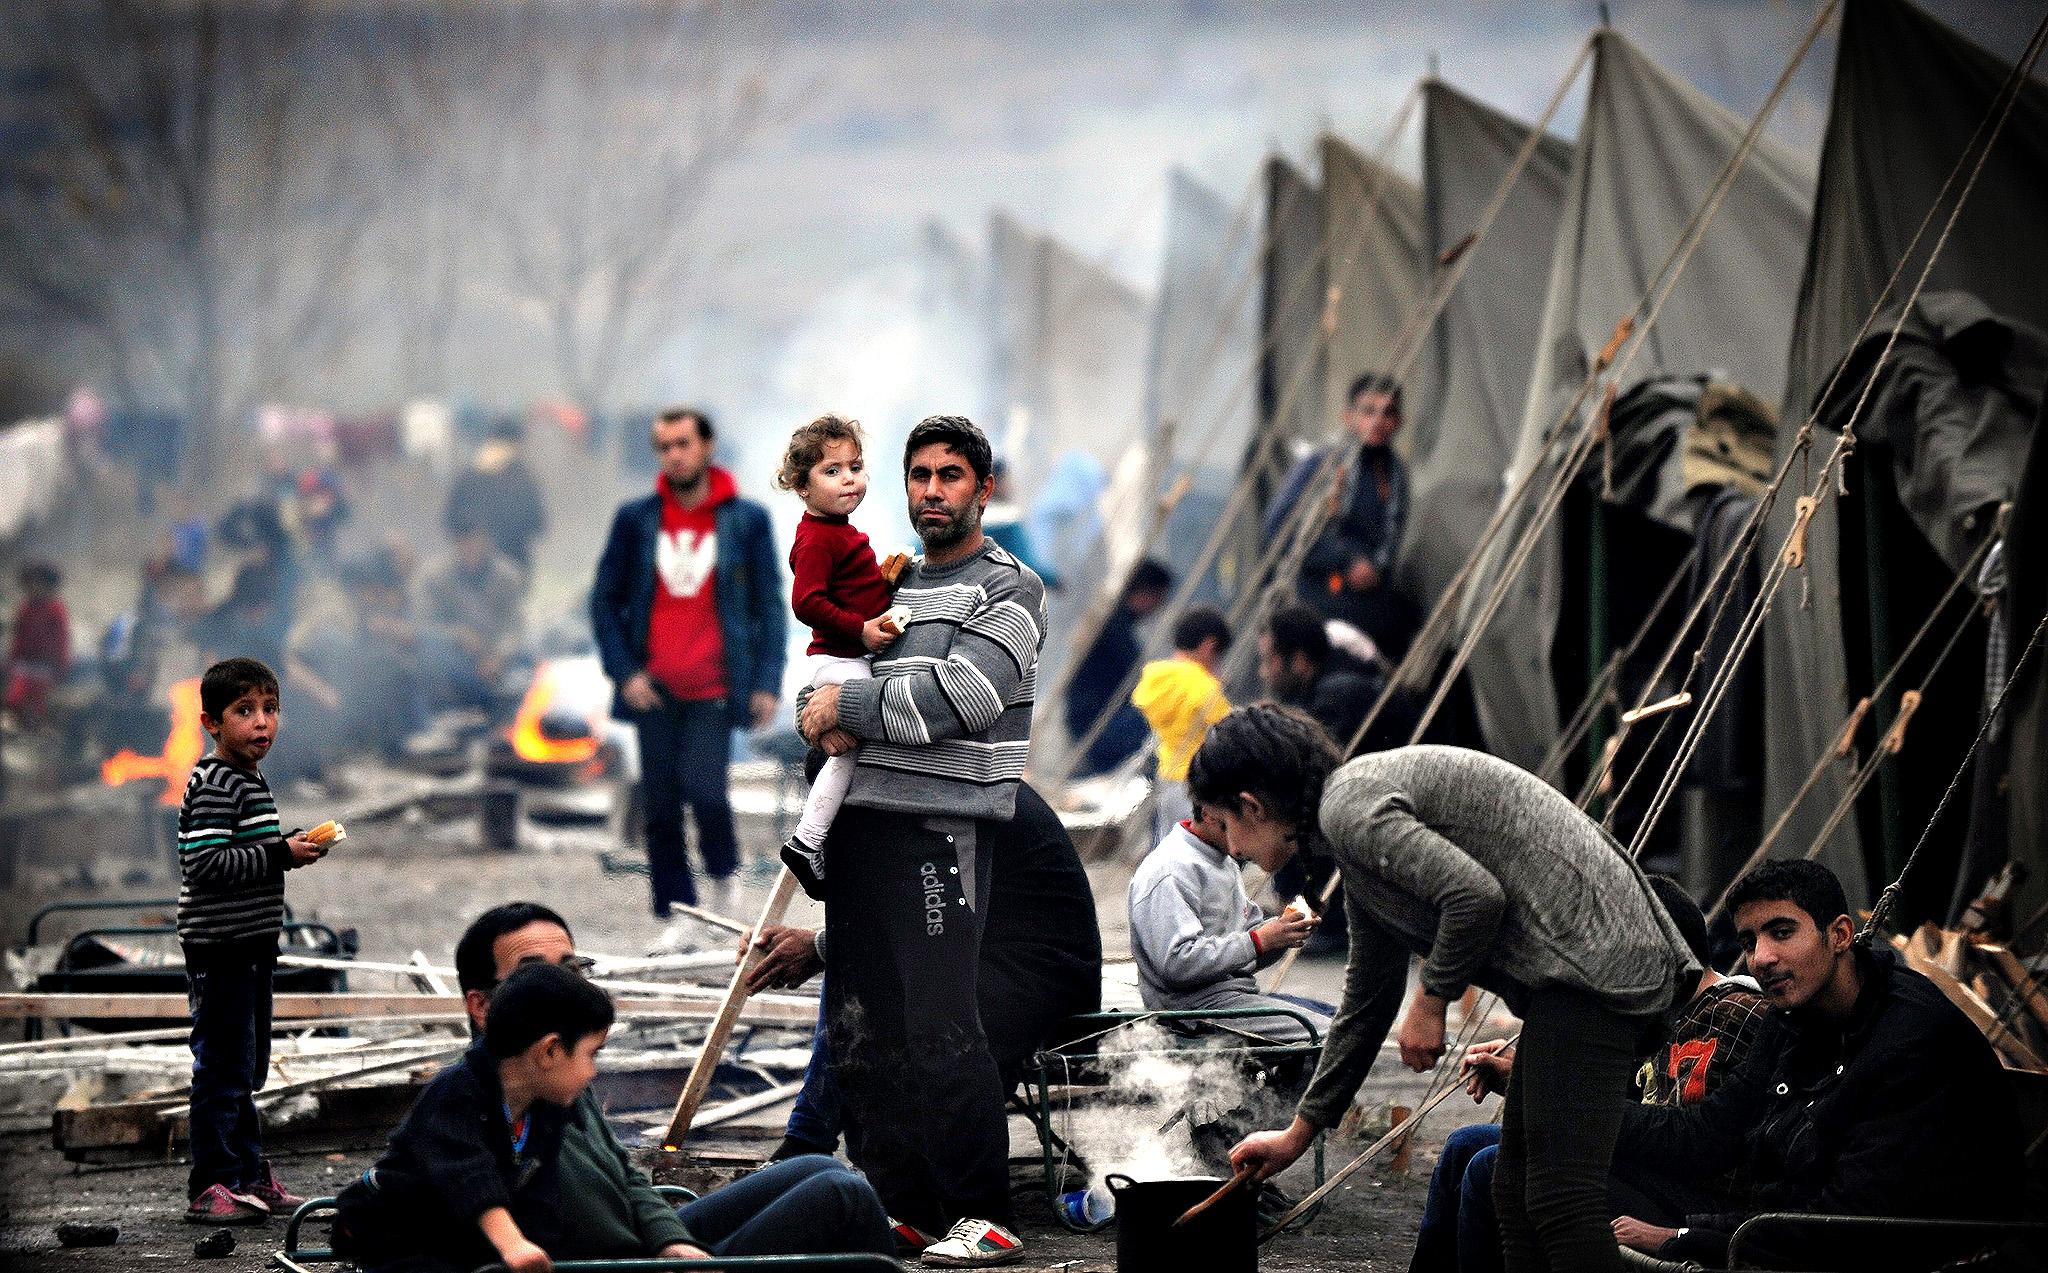 Slovenia blocks over 1,000 migrants at border